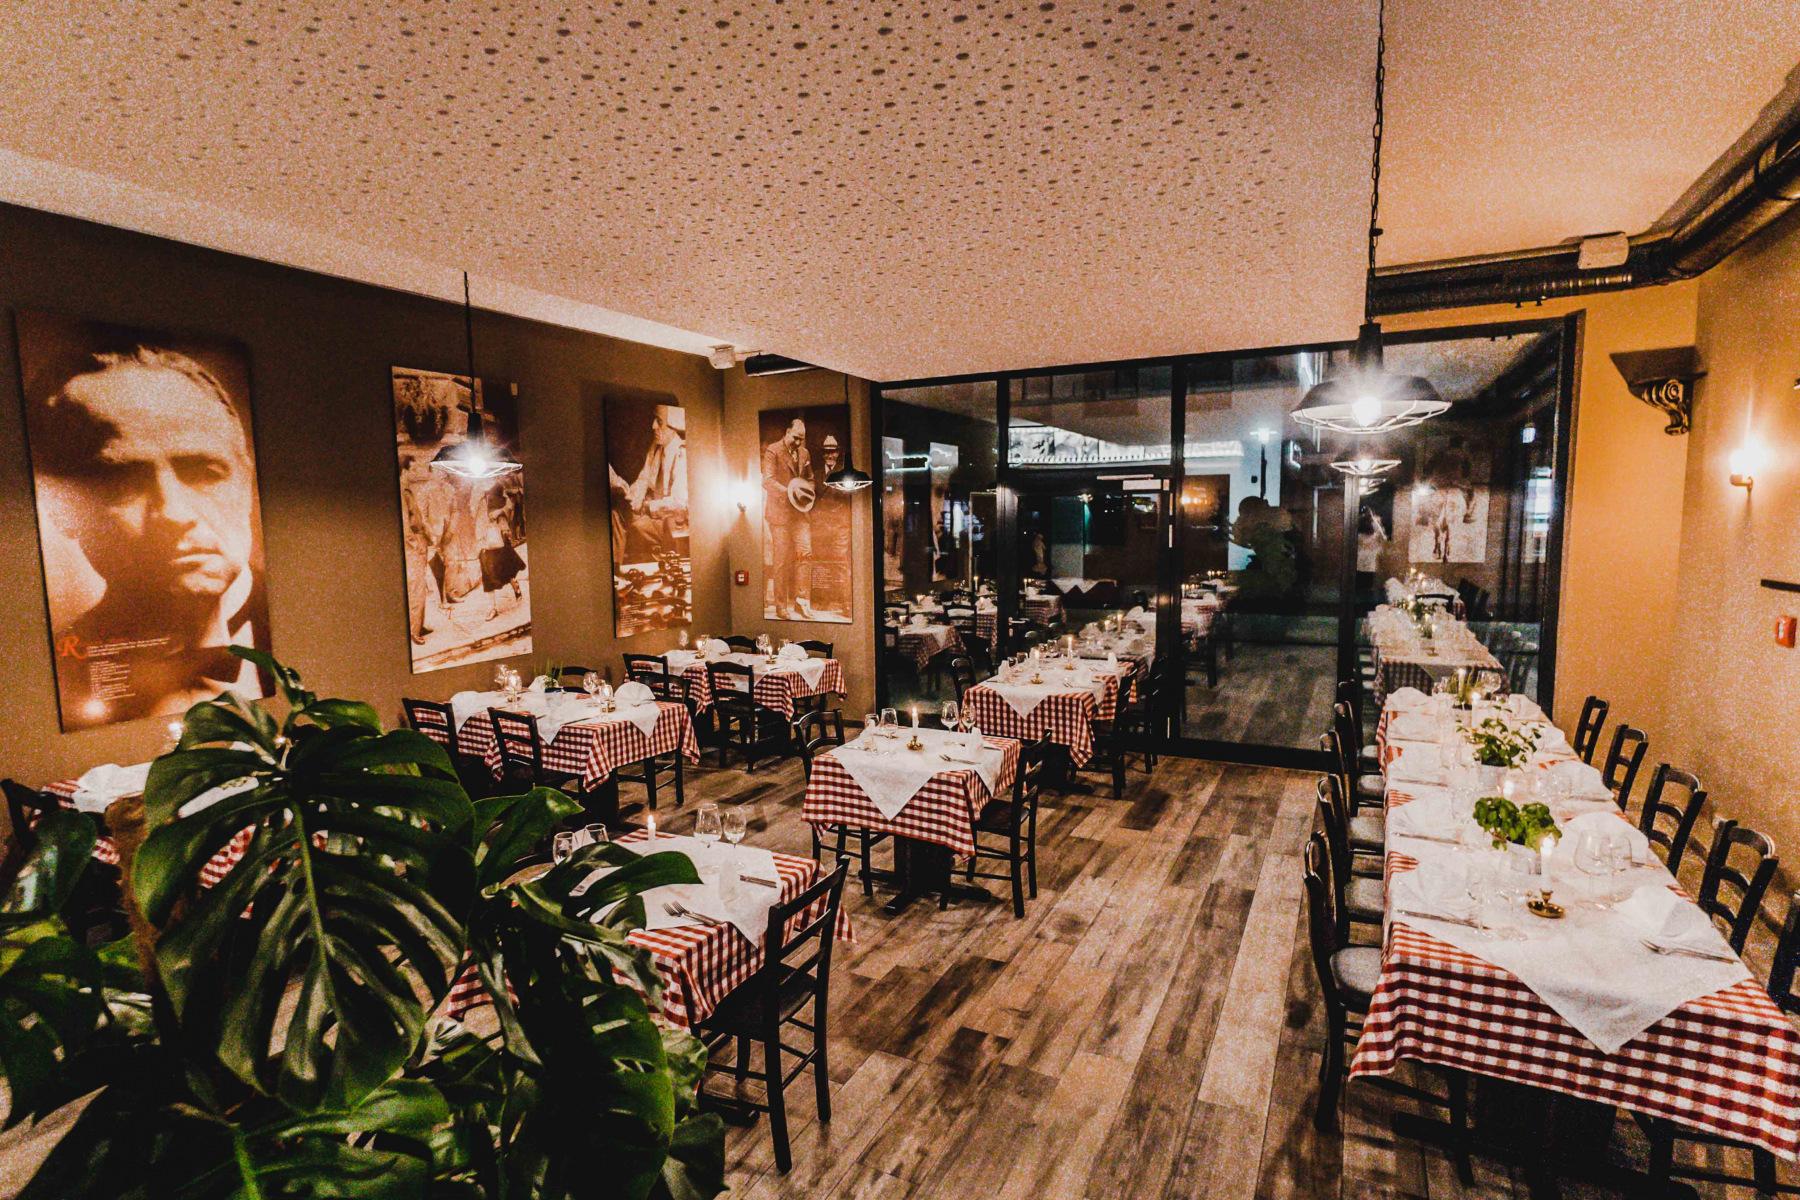 Pizzeria_Osteria_Siciliana_Nebenraum